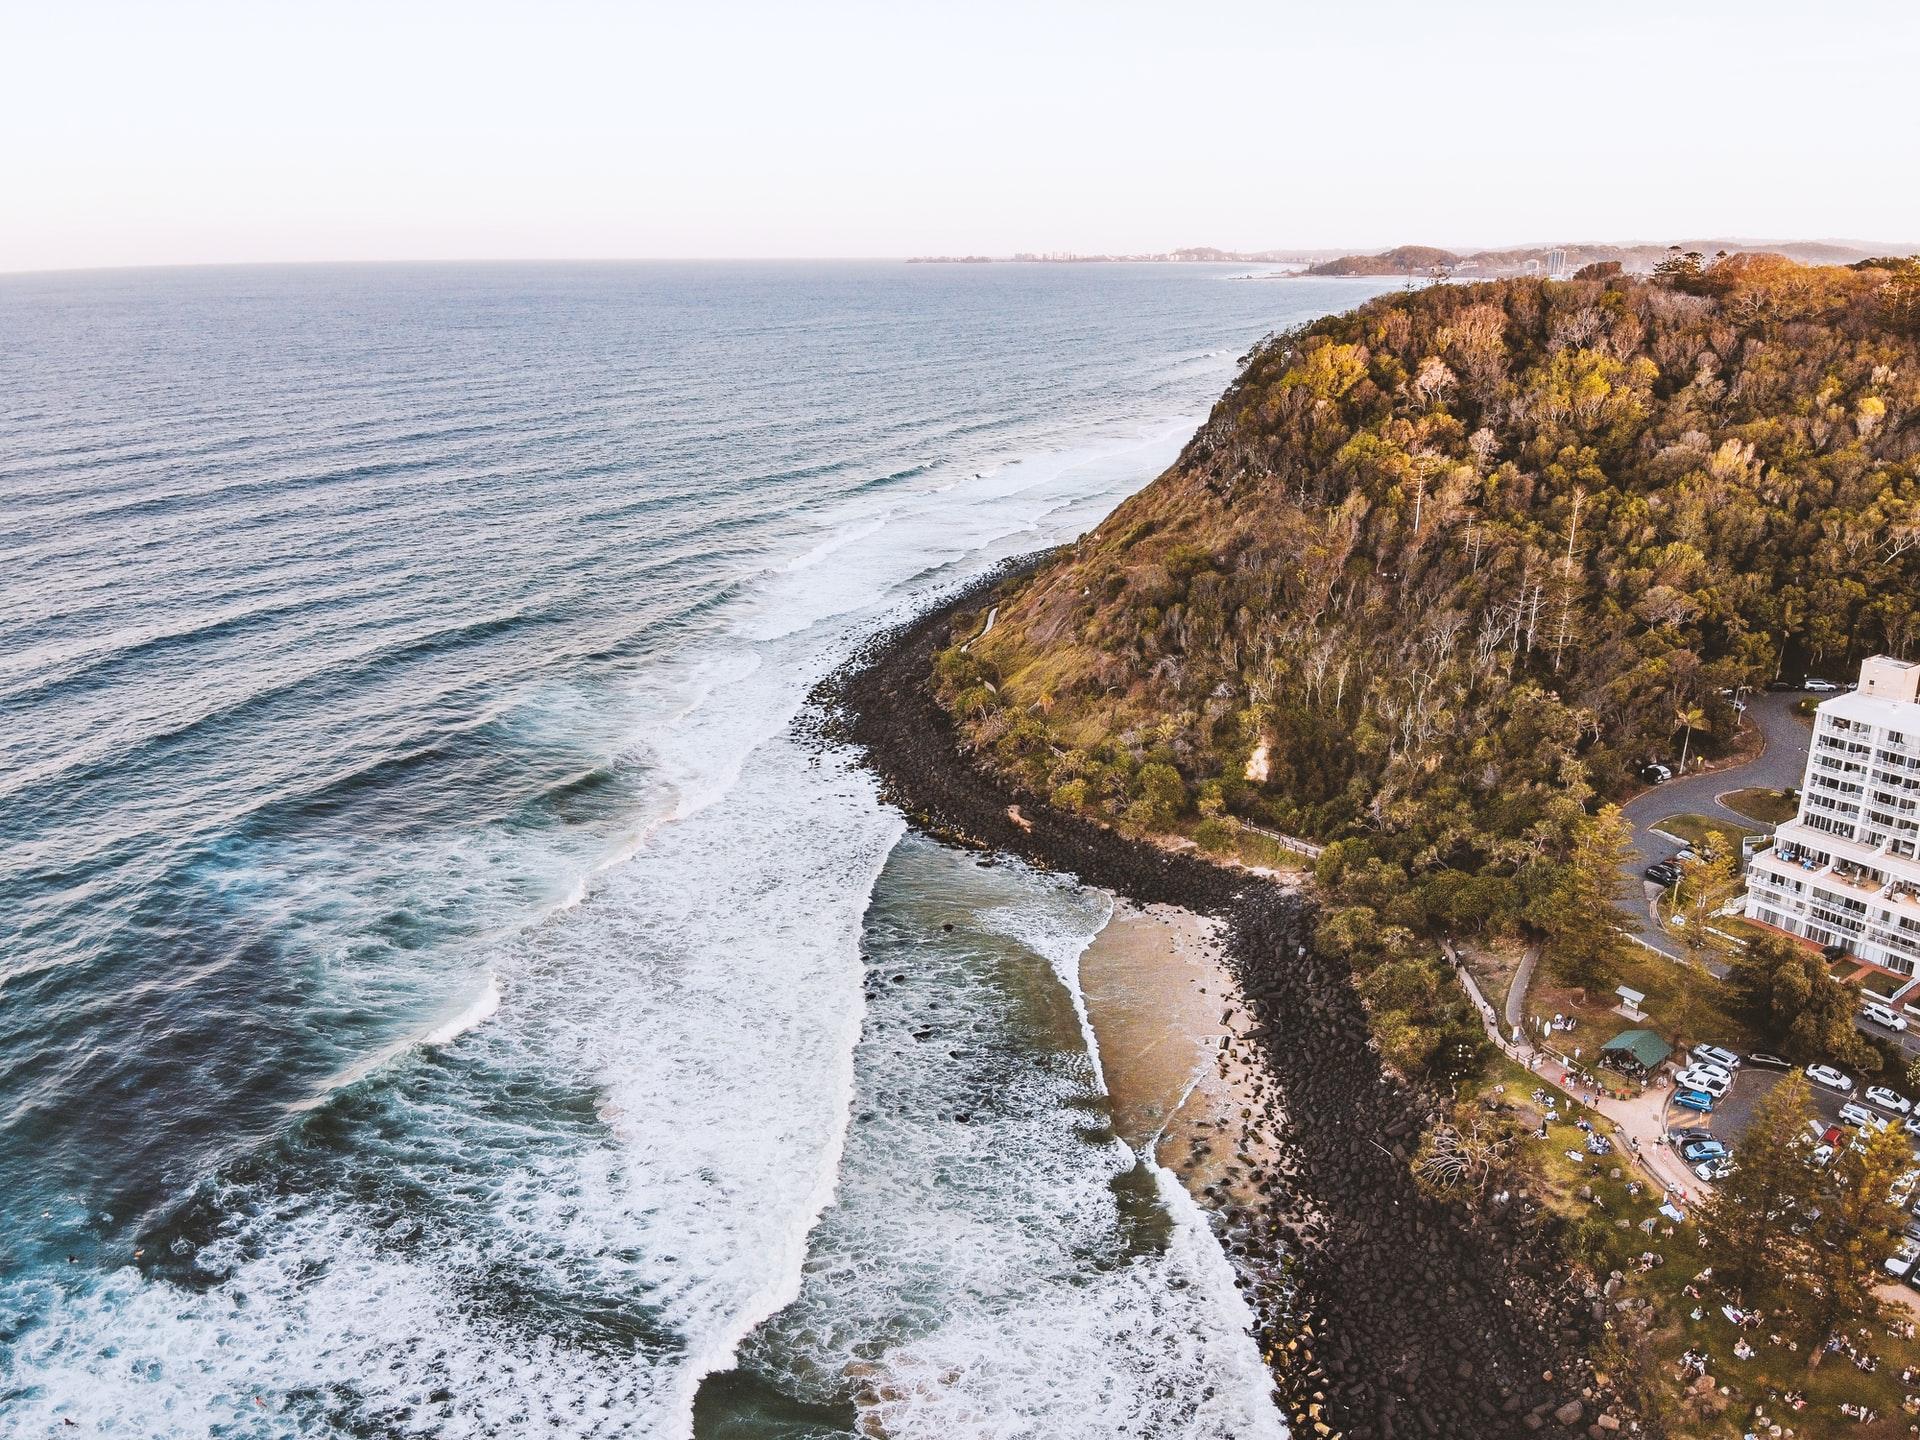 Burleigh Heads QLD, Australia